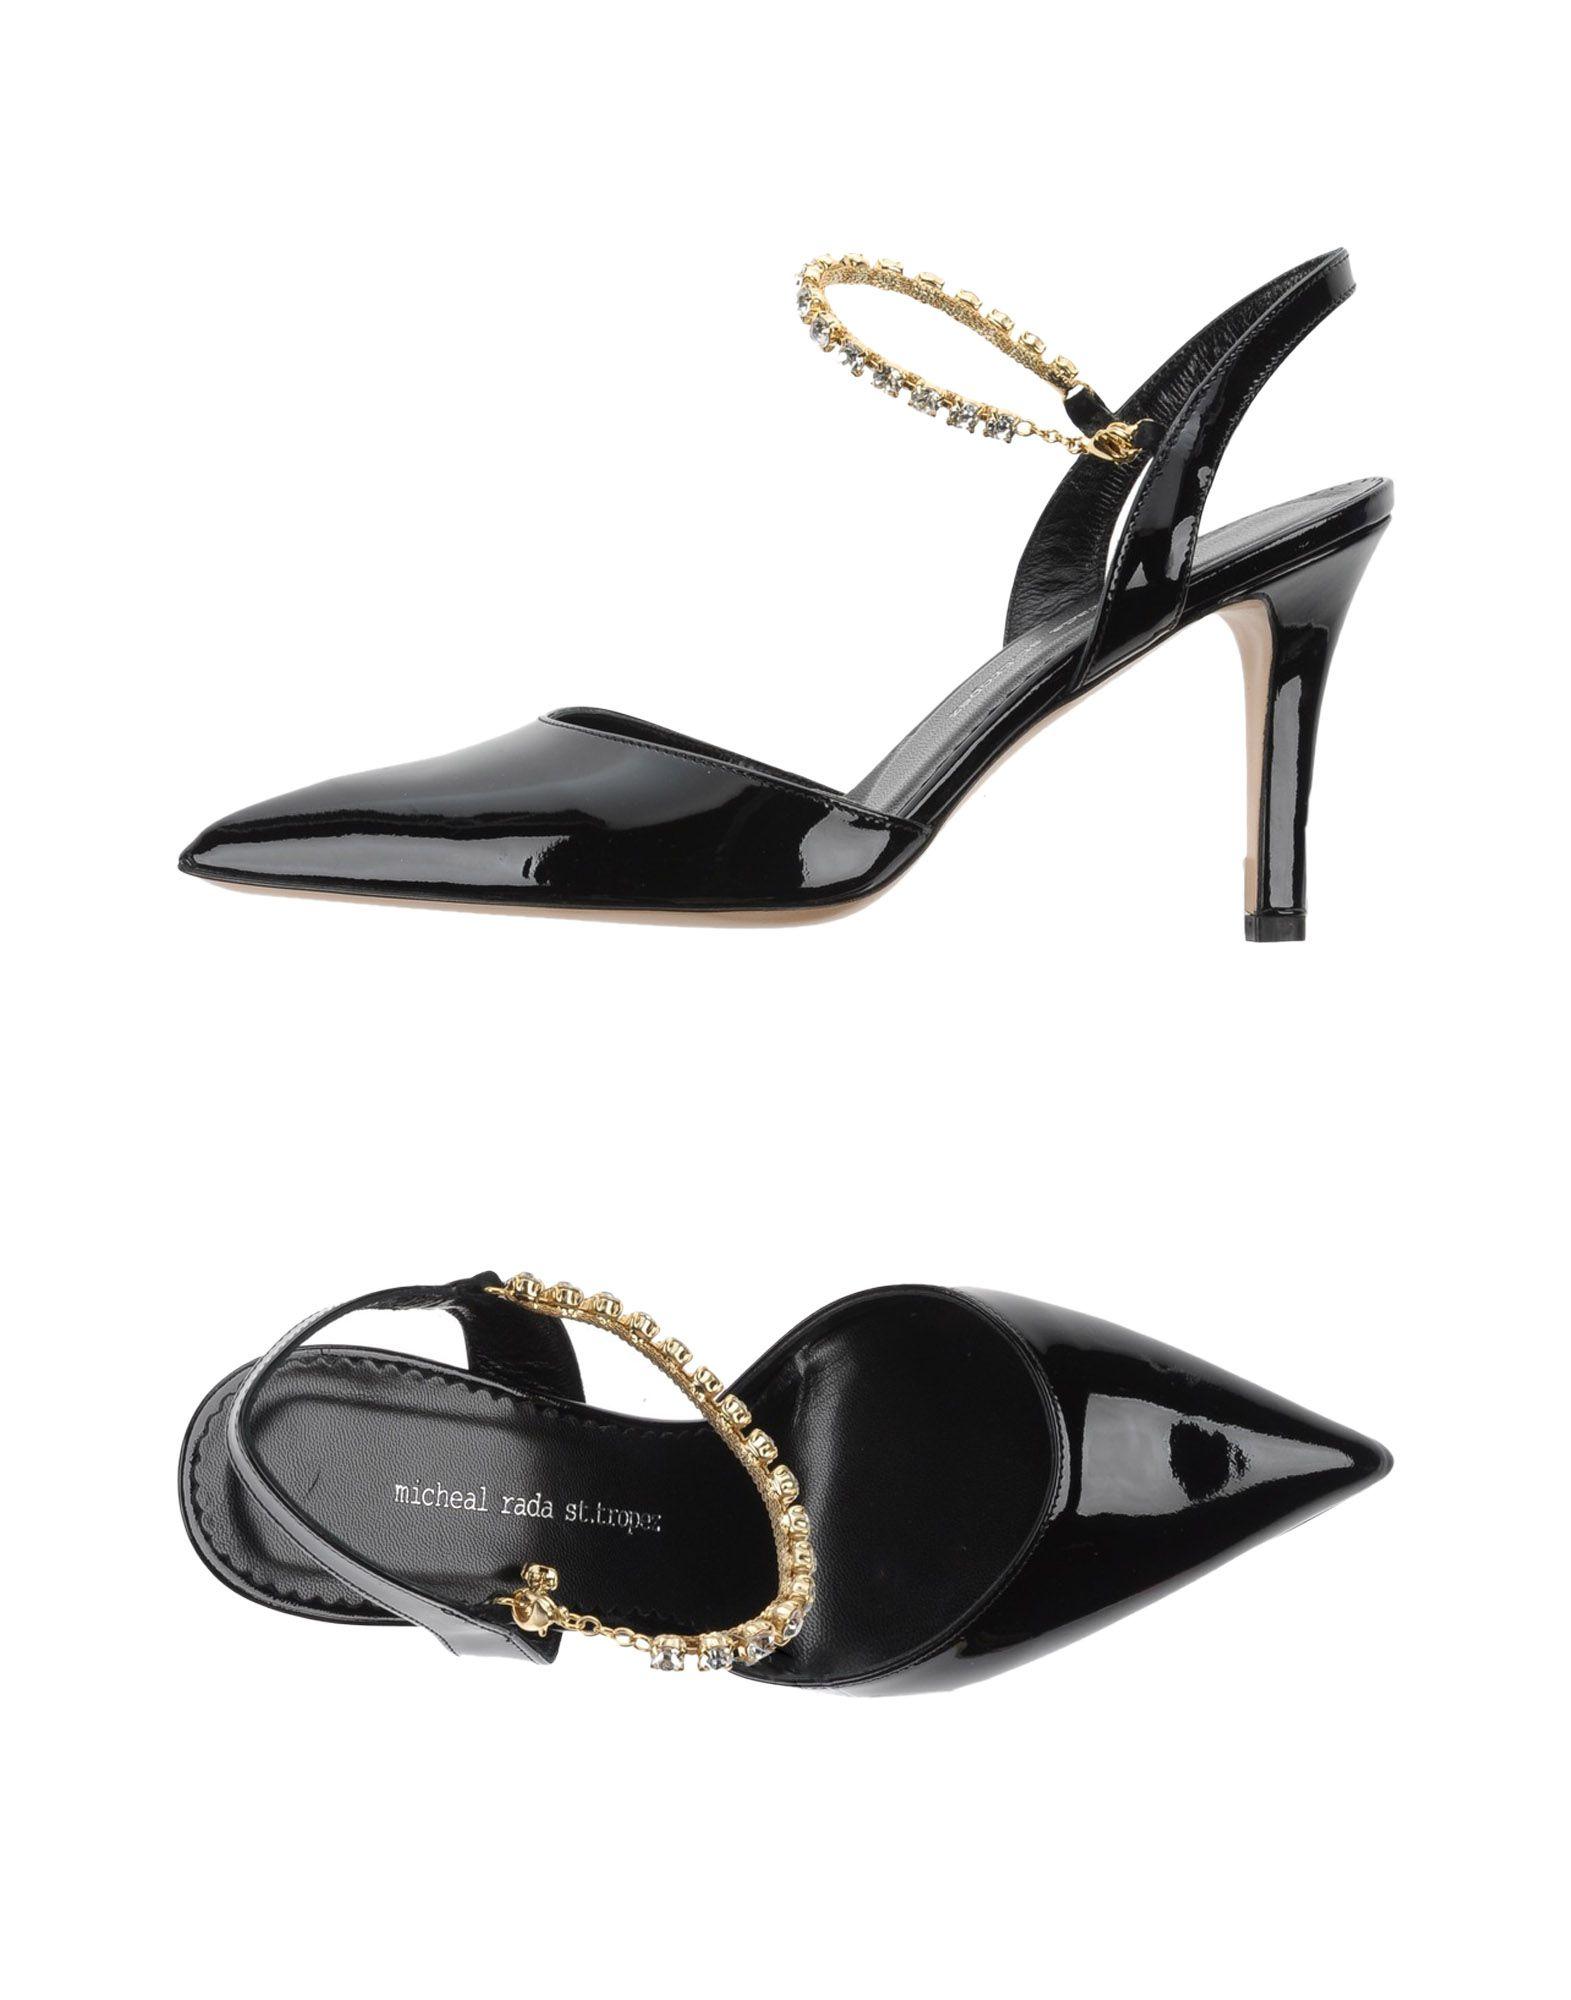 MICHEAL RADA ST.TROPEZ Туфли цены онлайн